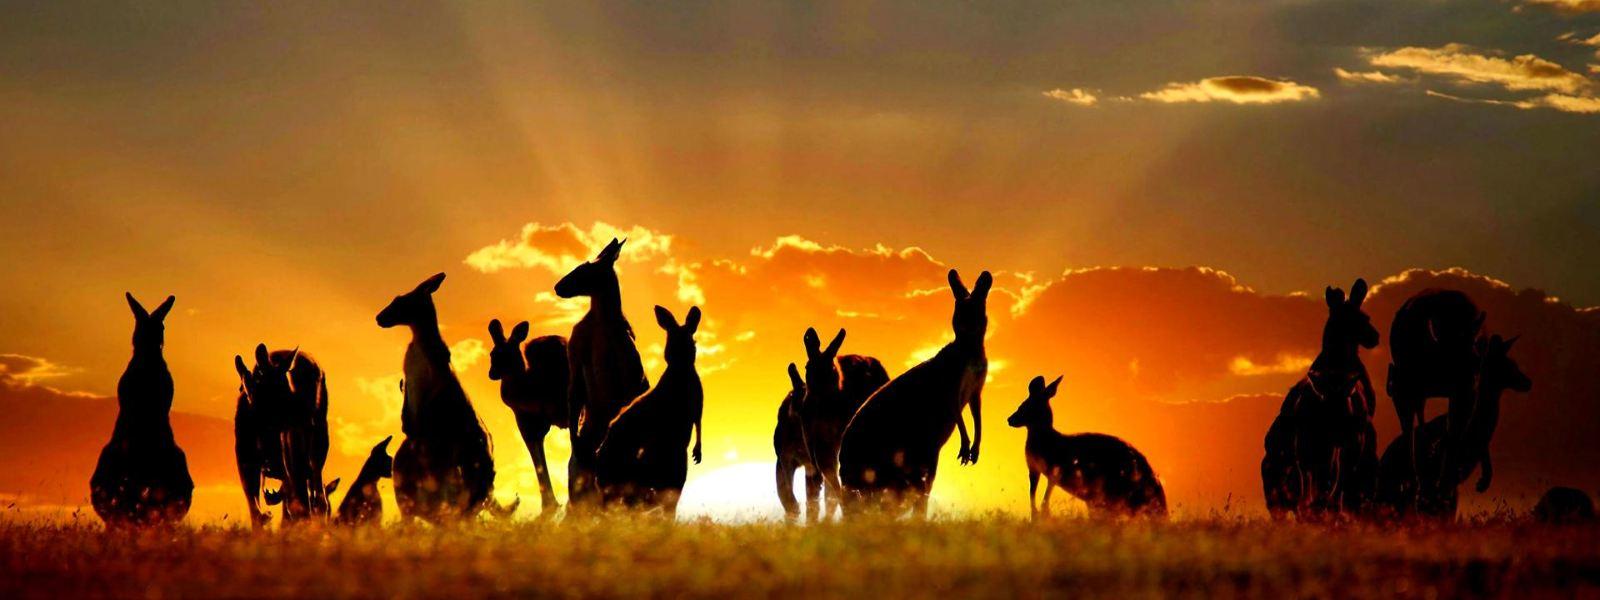 кенгуру на выпасе